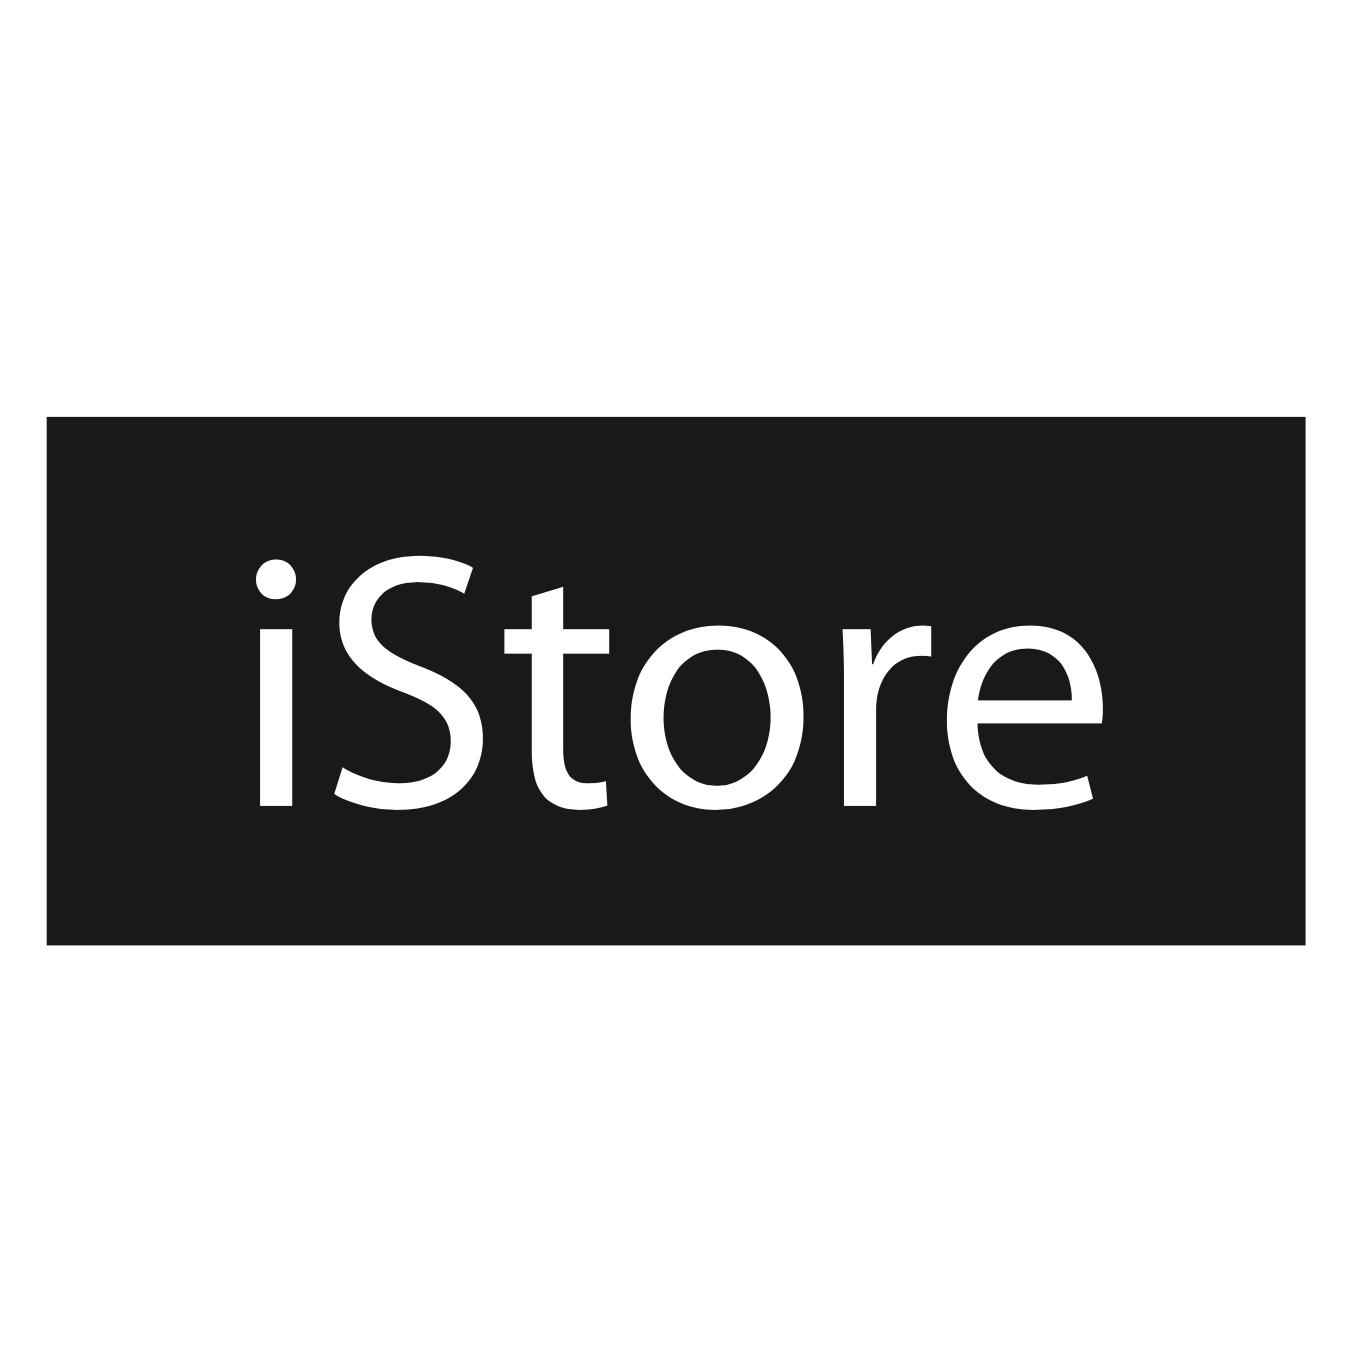 iPhone 7 128GB - Silver